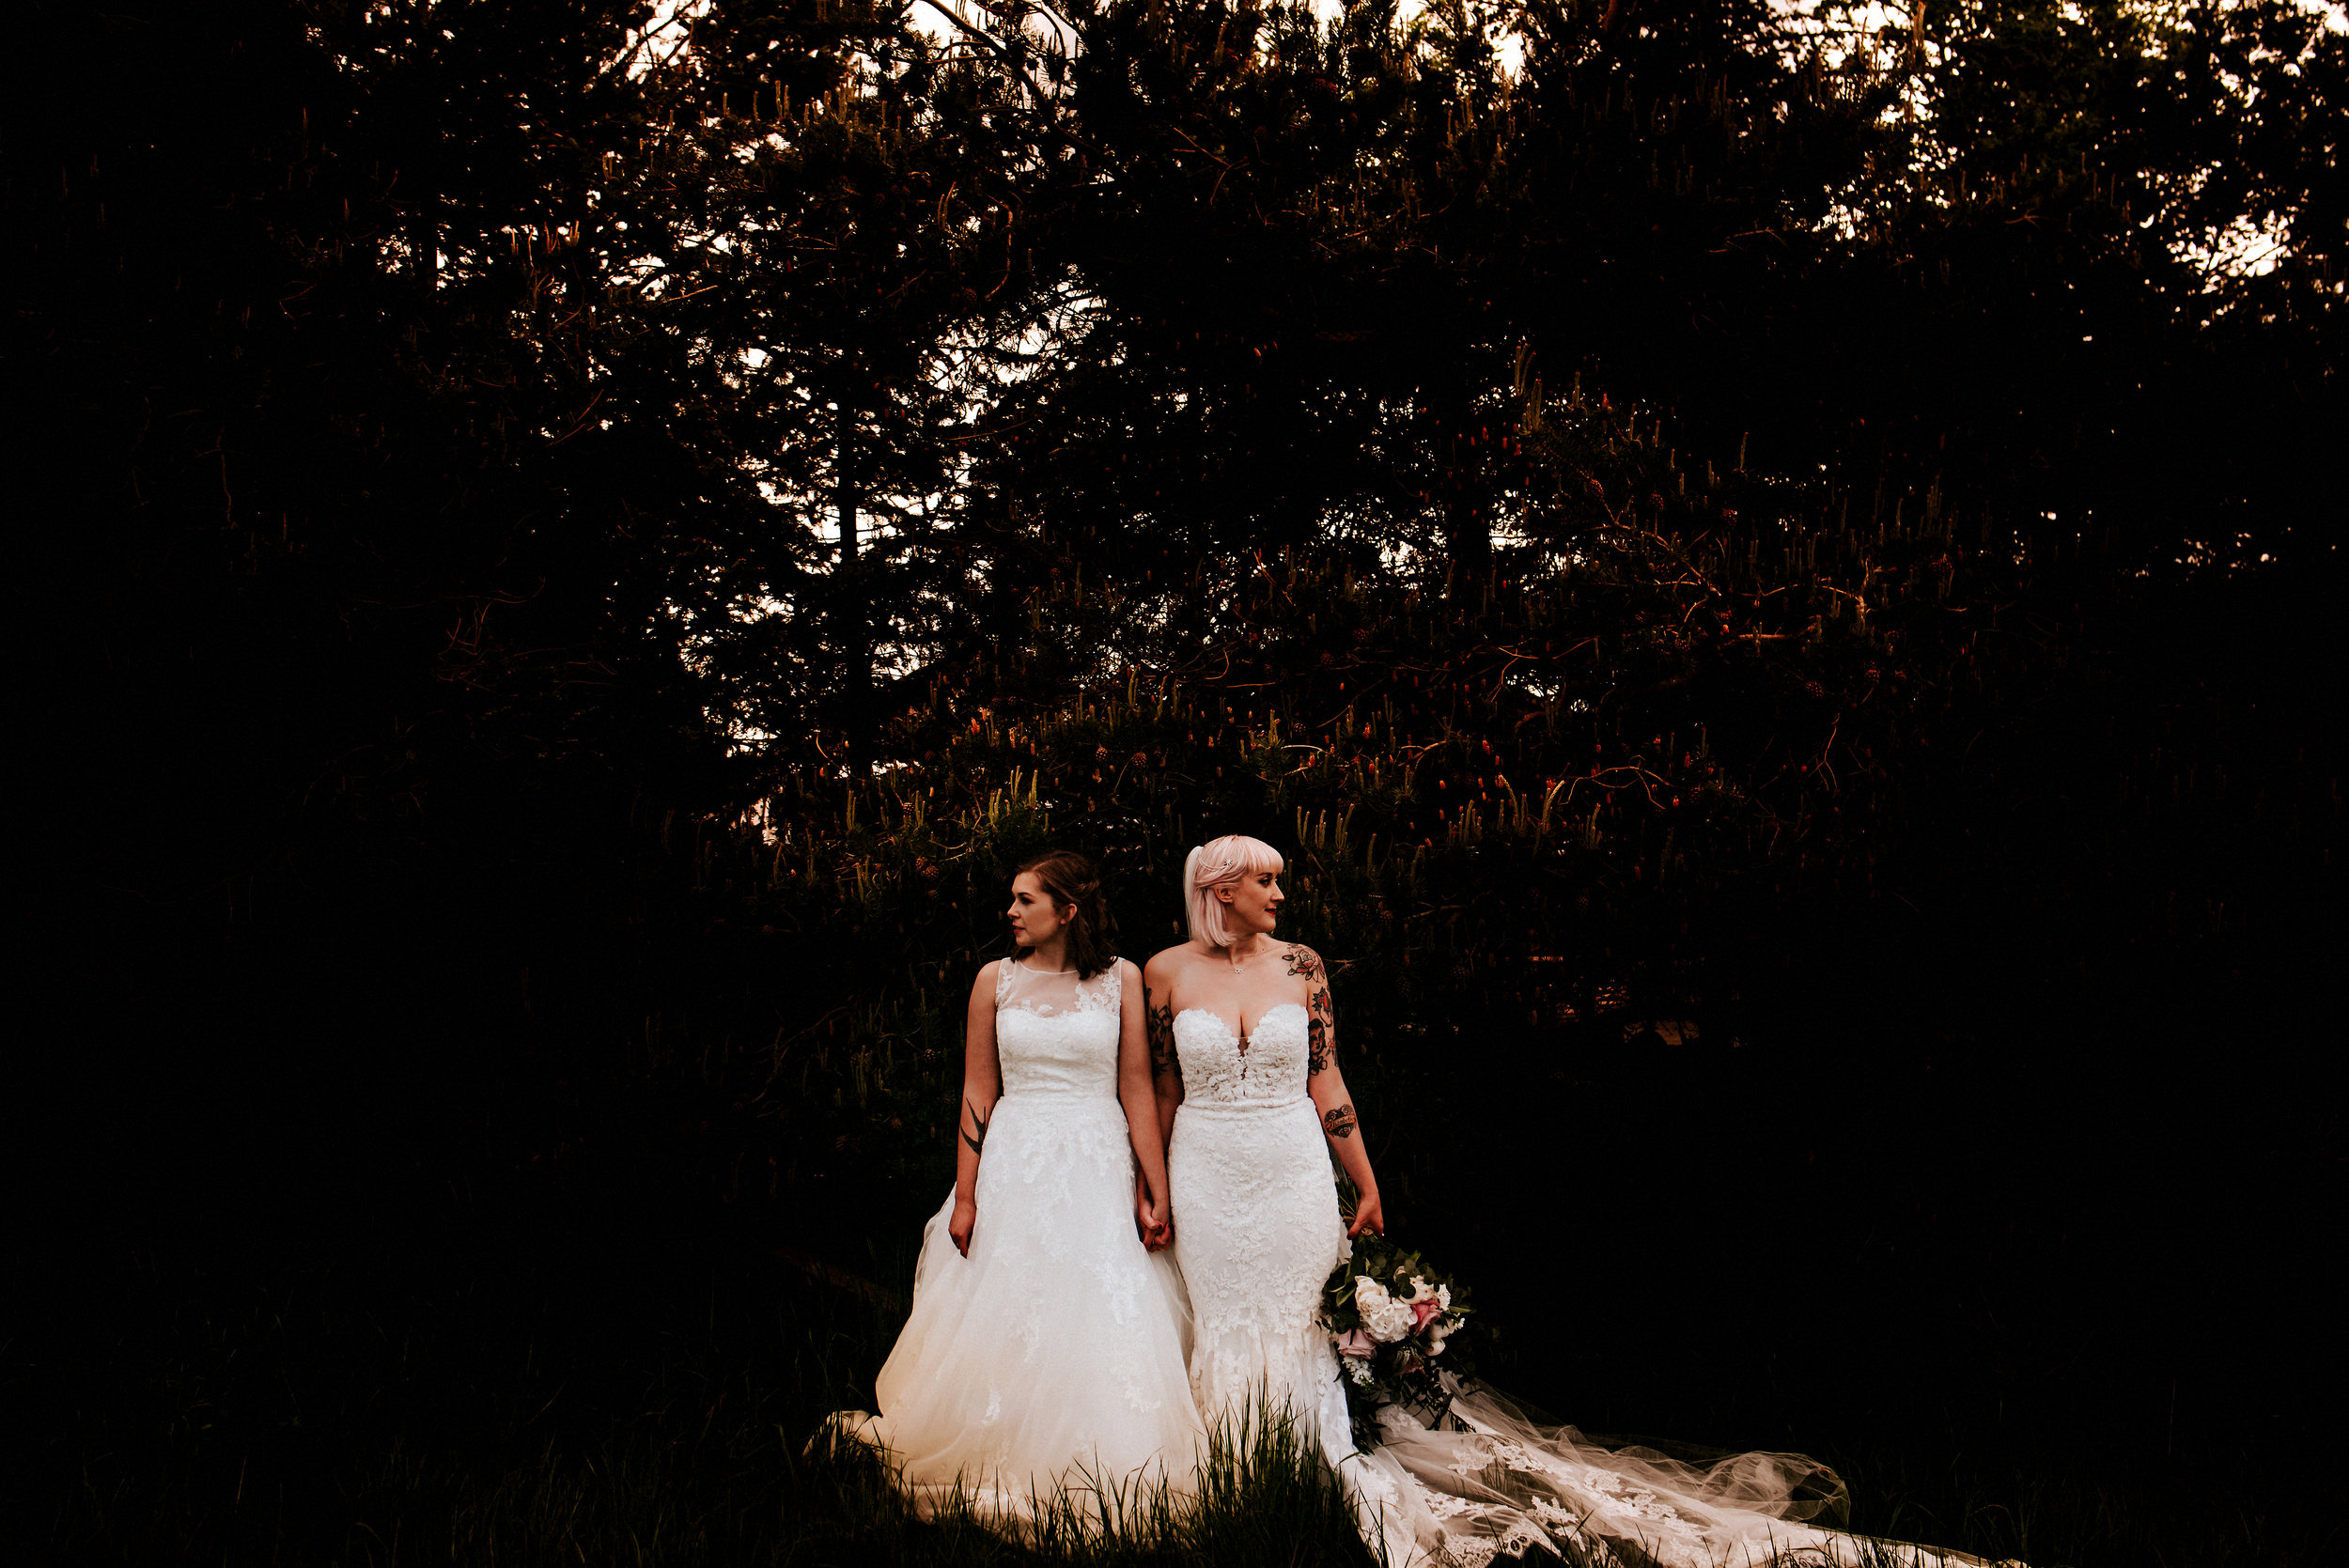 alternative-wedding-deepdale-farm-yorkshire-woodland-artistic-same-sex-couple-photos.jpg